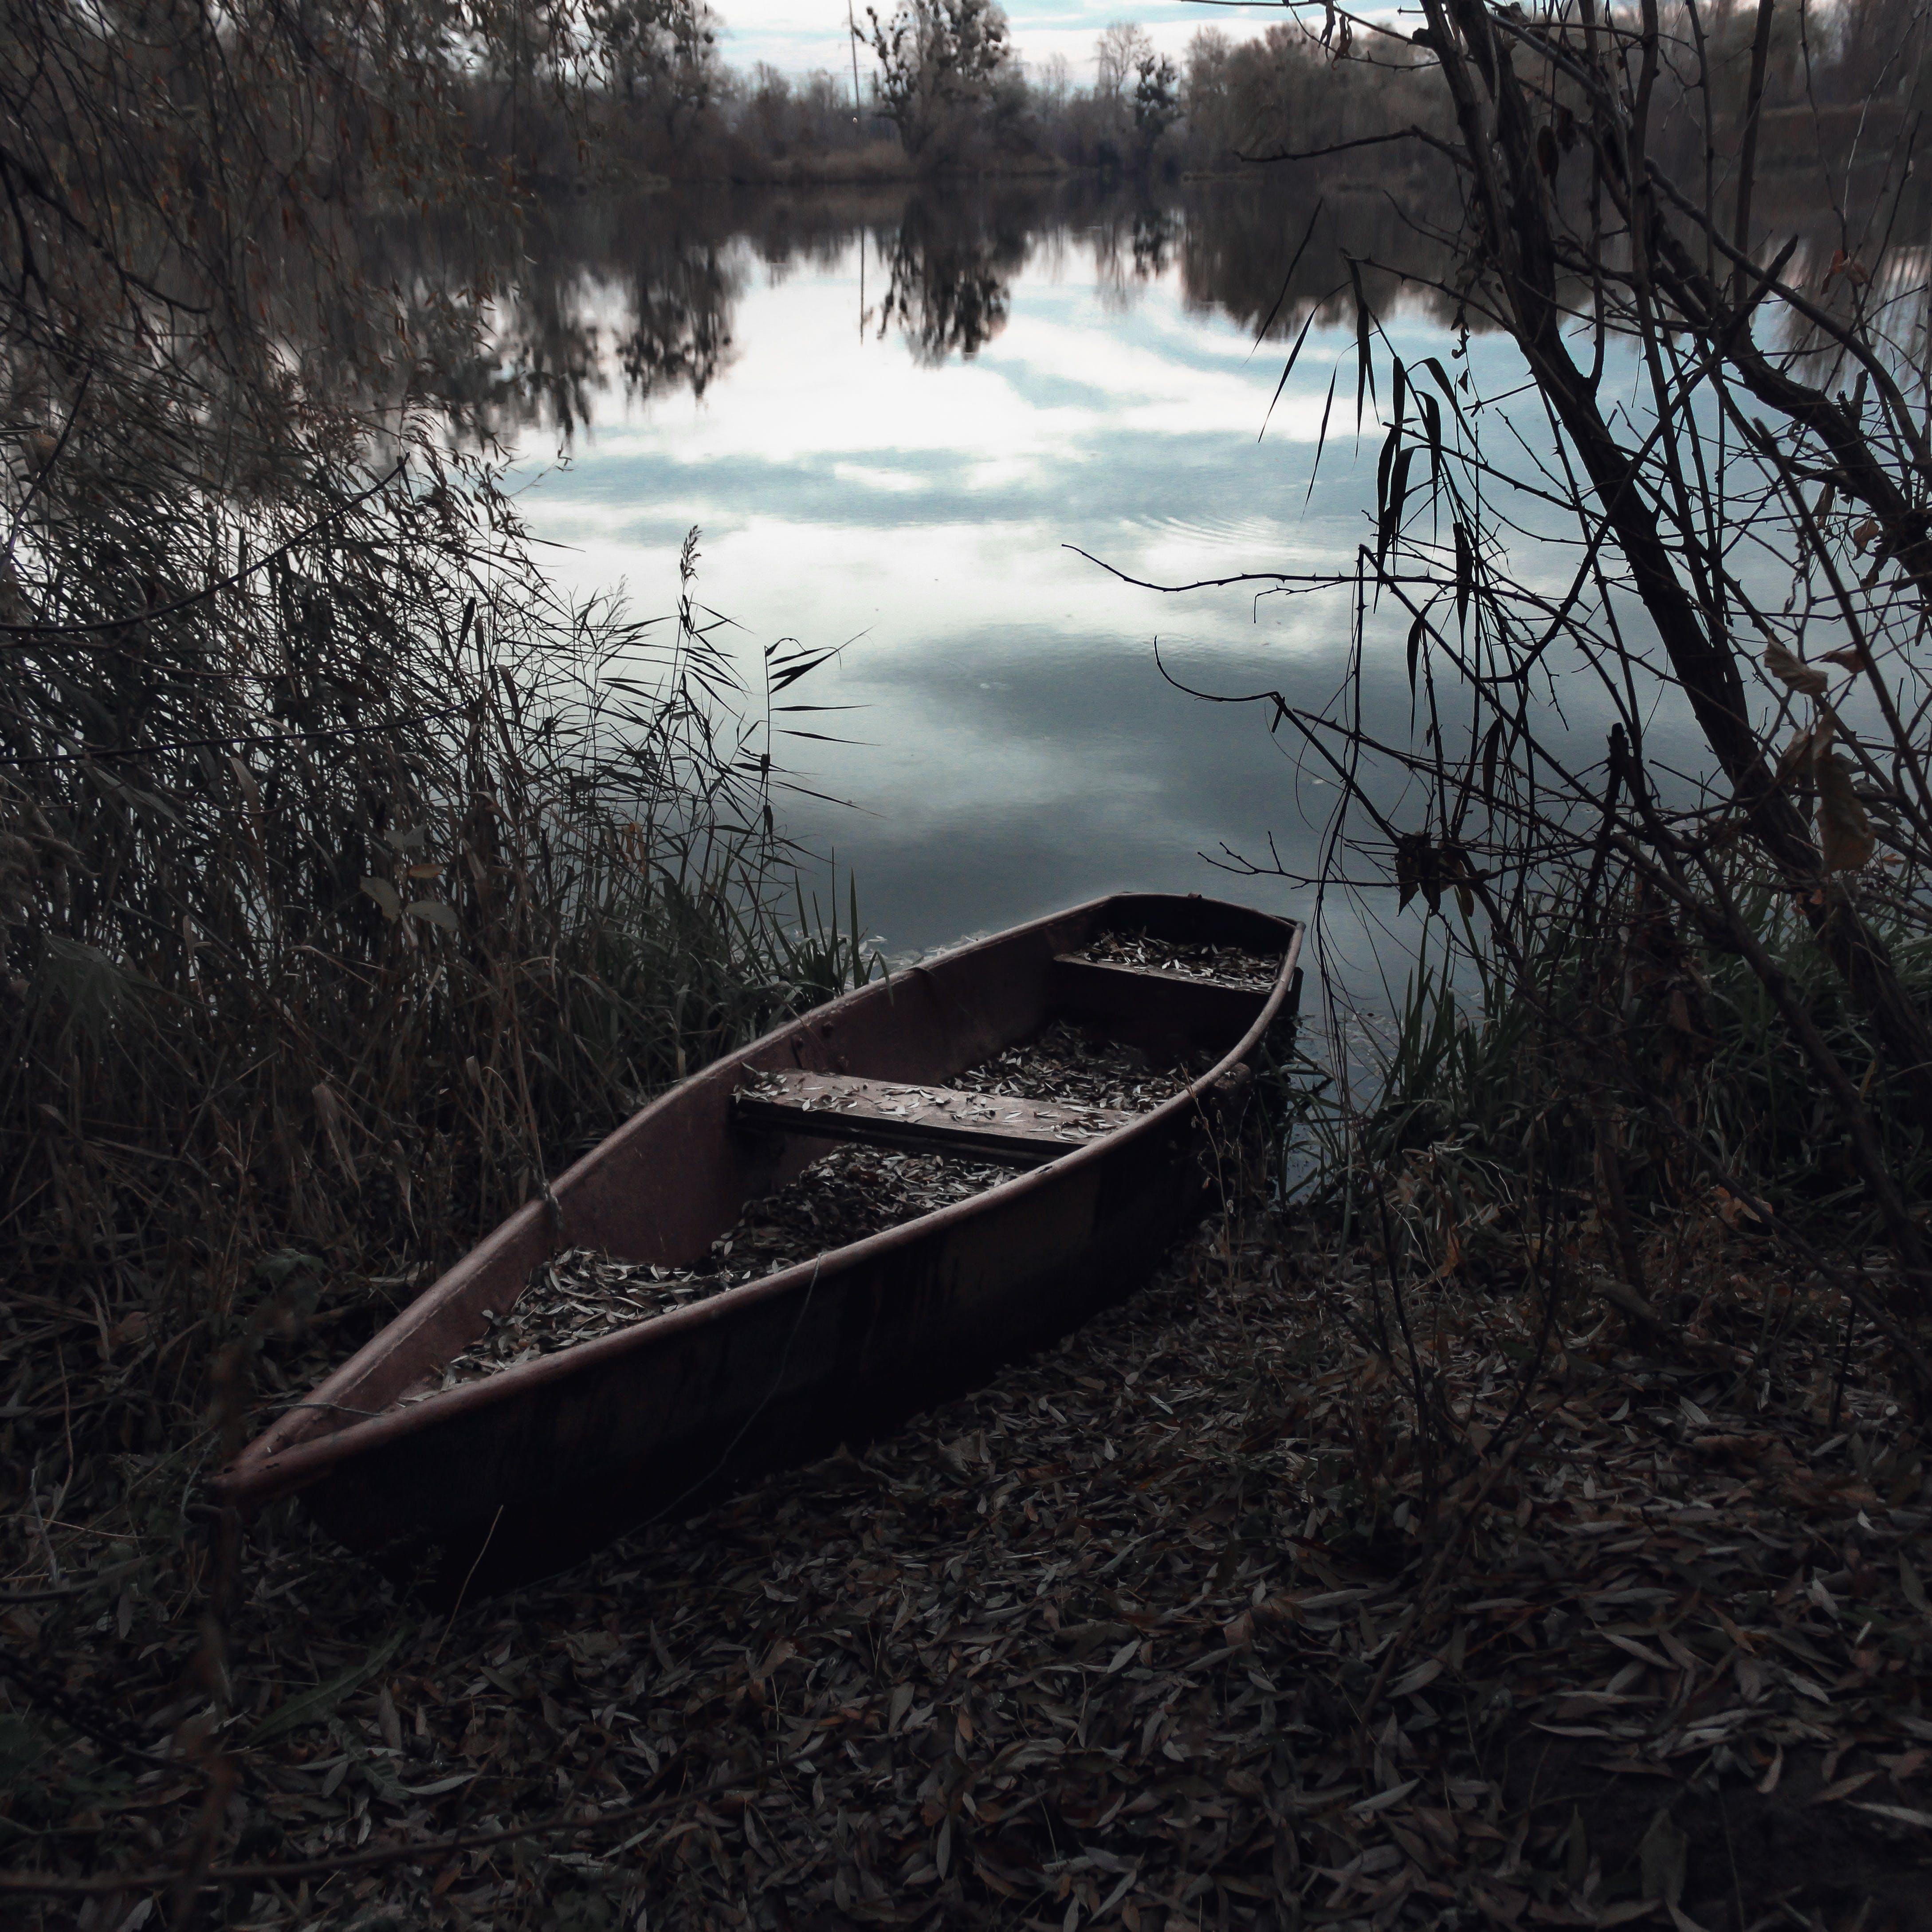 Canoe Boat in Shore